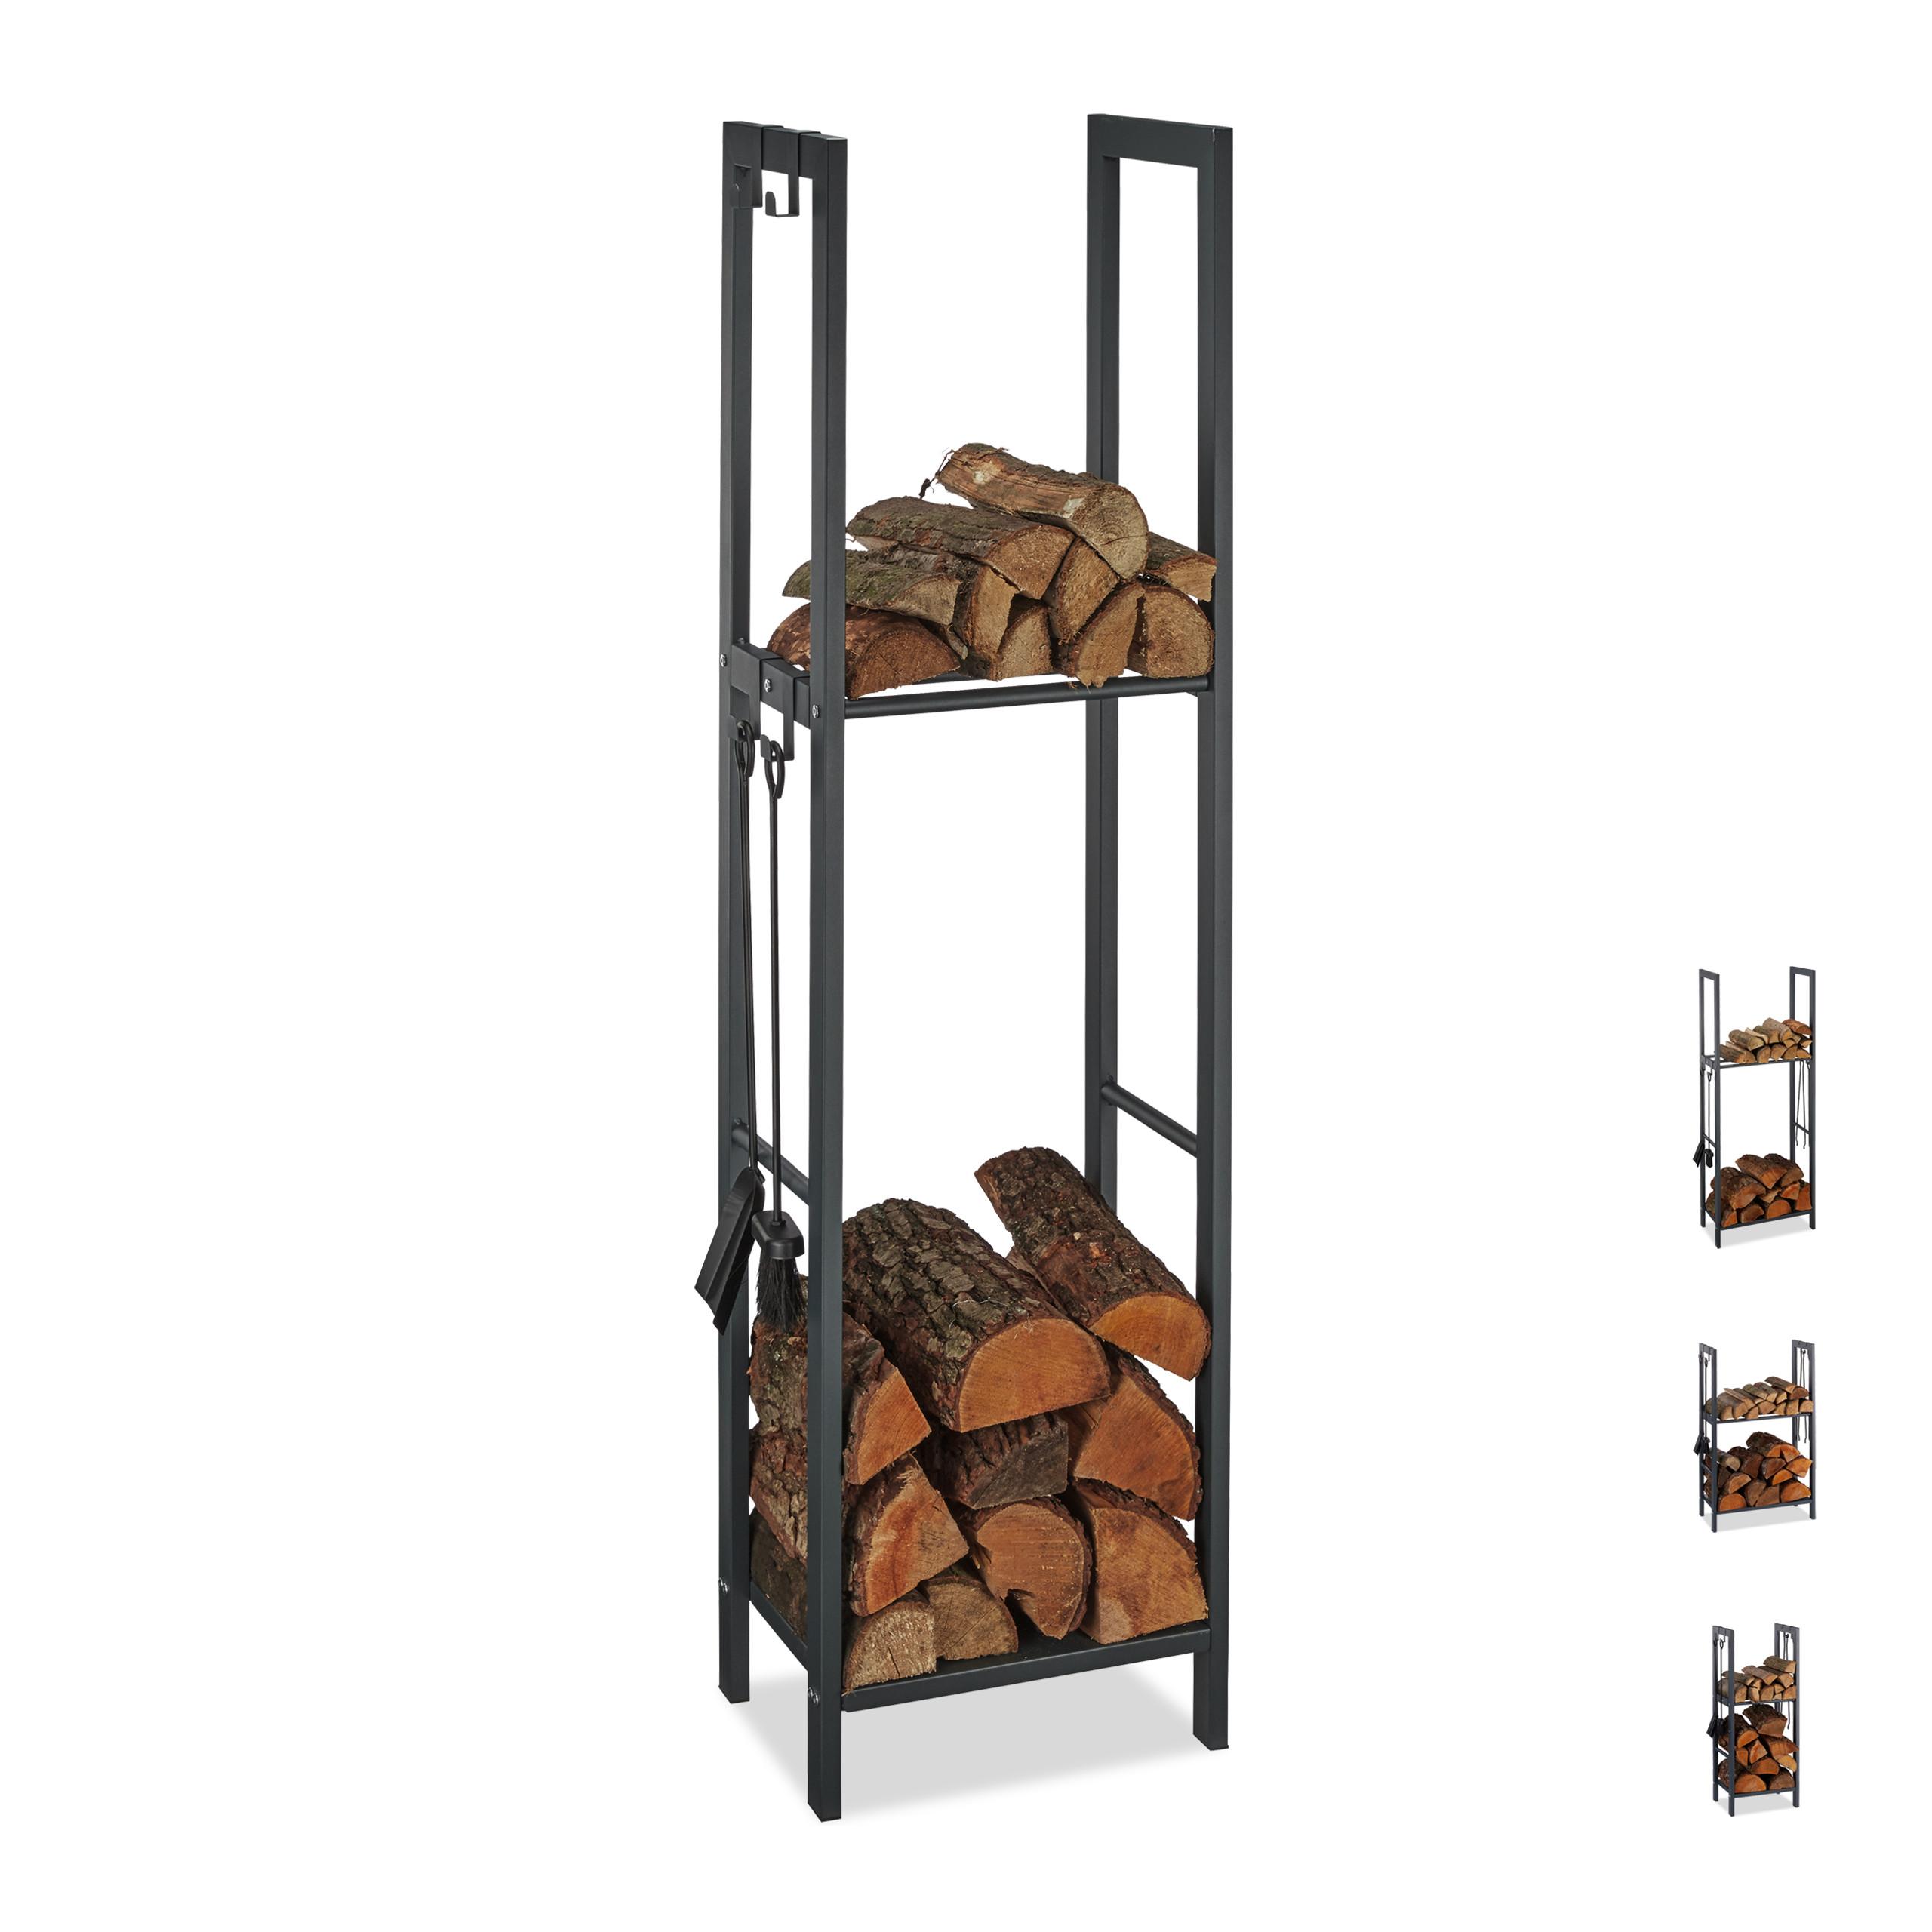 etag re de chemin e tag re b ches bois acier panier bois porte b ches 150x40 ebay. Black Bedroom Furniture Sets. Home Design Ideas